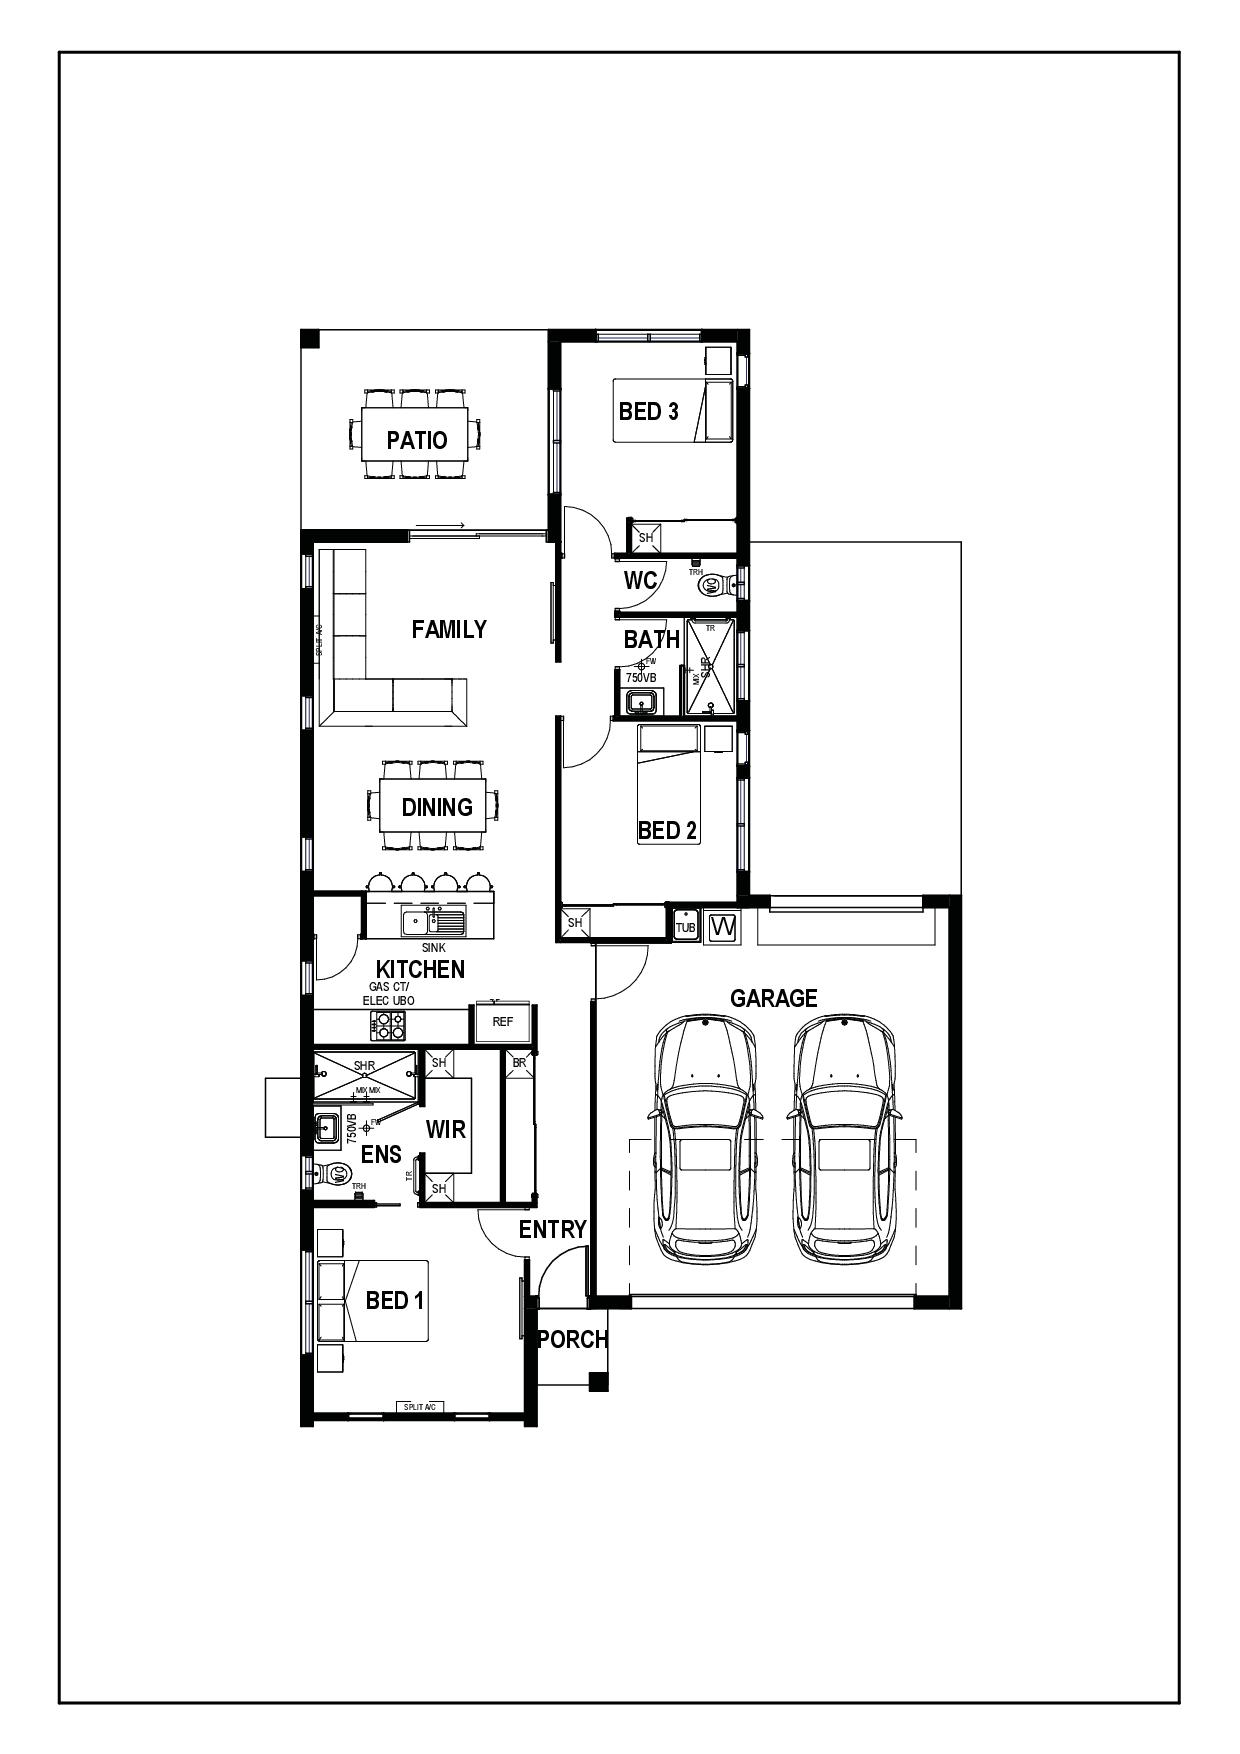 Carramar A 146 Double Garage Version 2017 Floor Plan.jpg